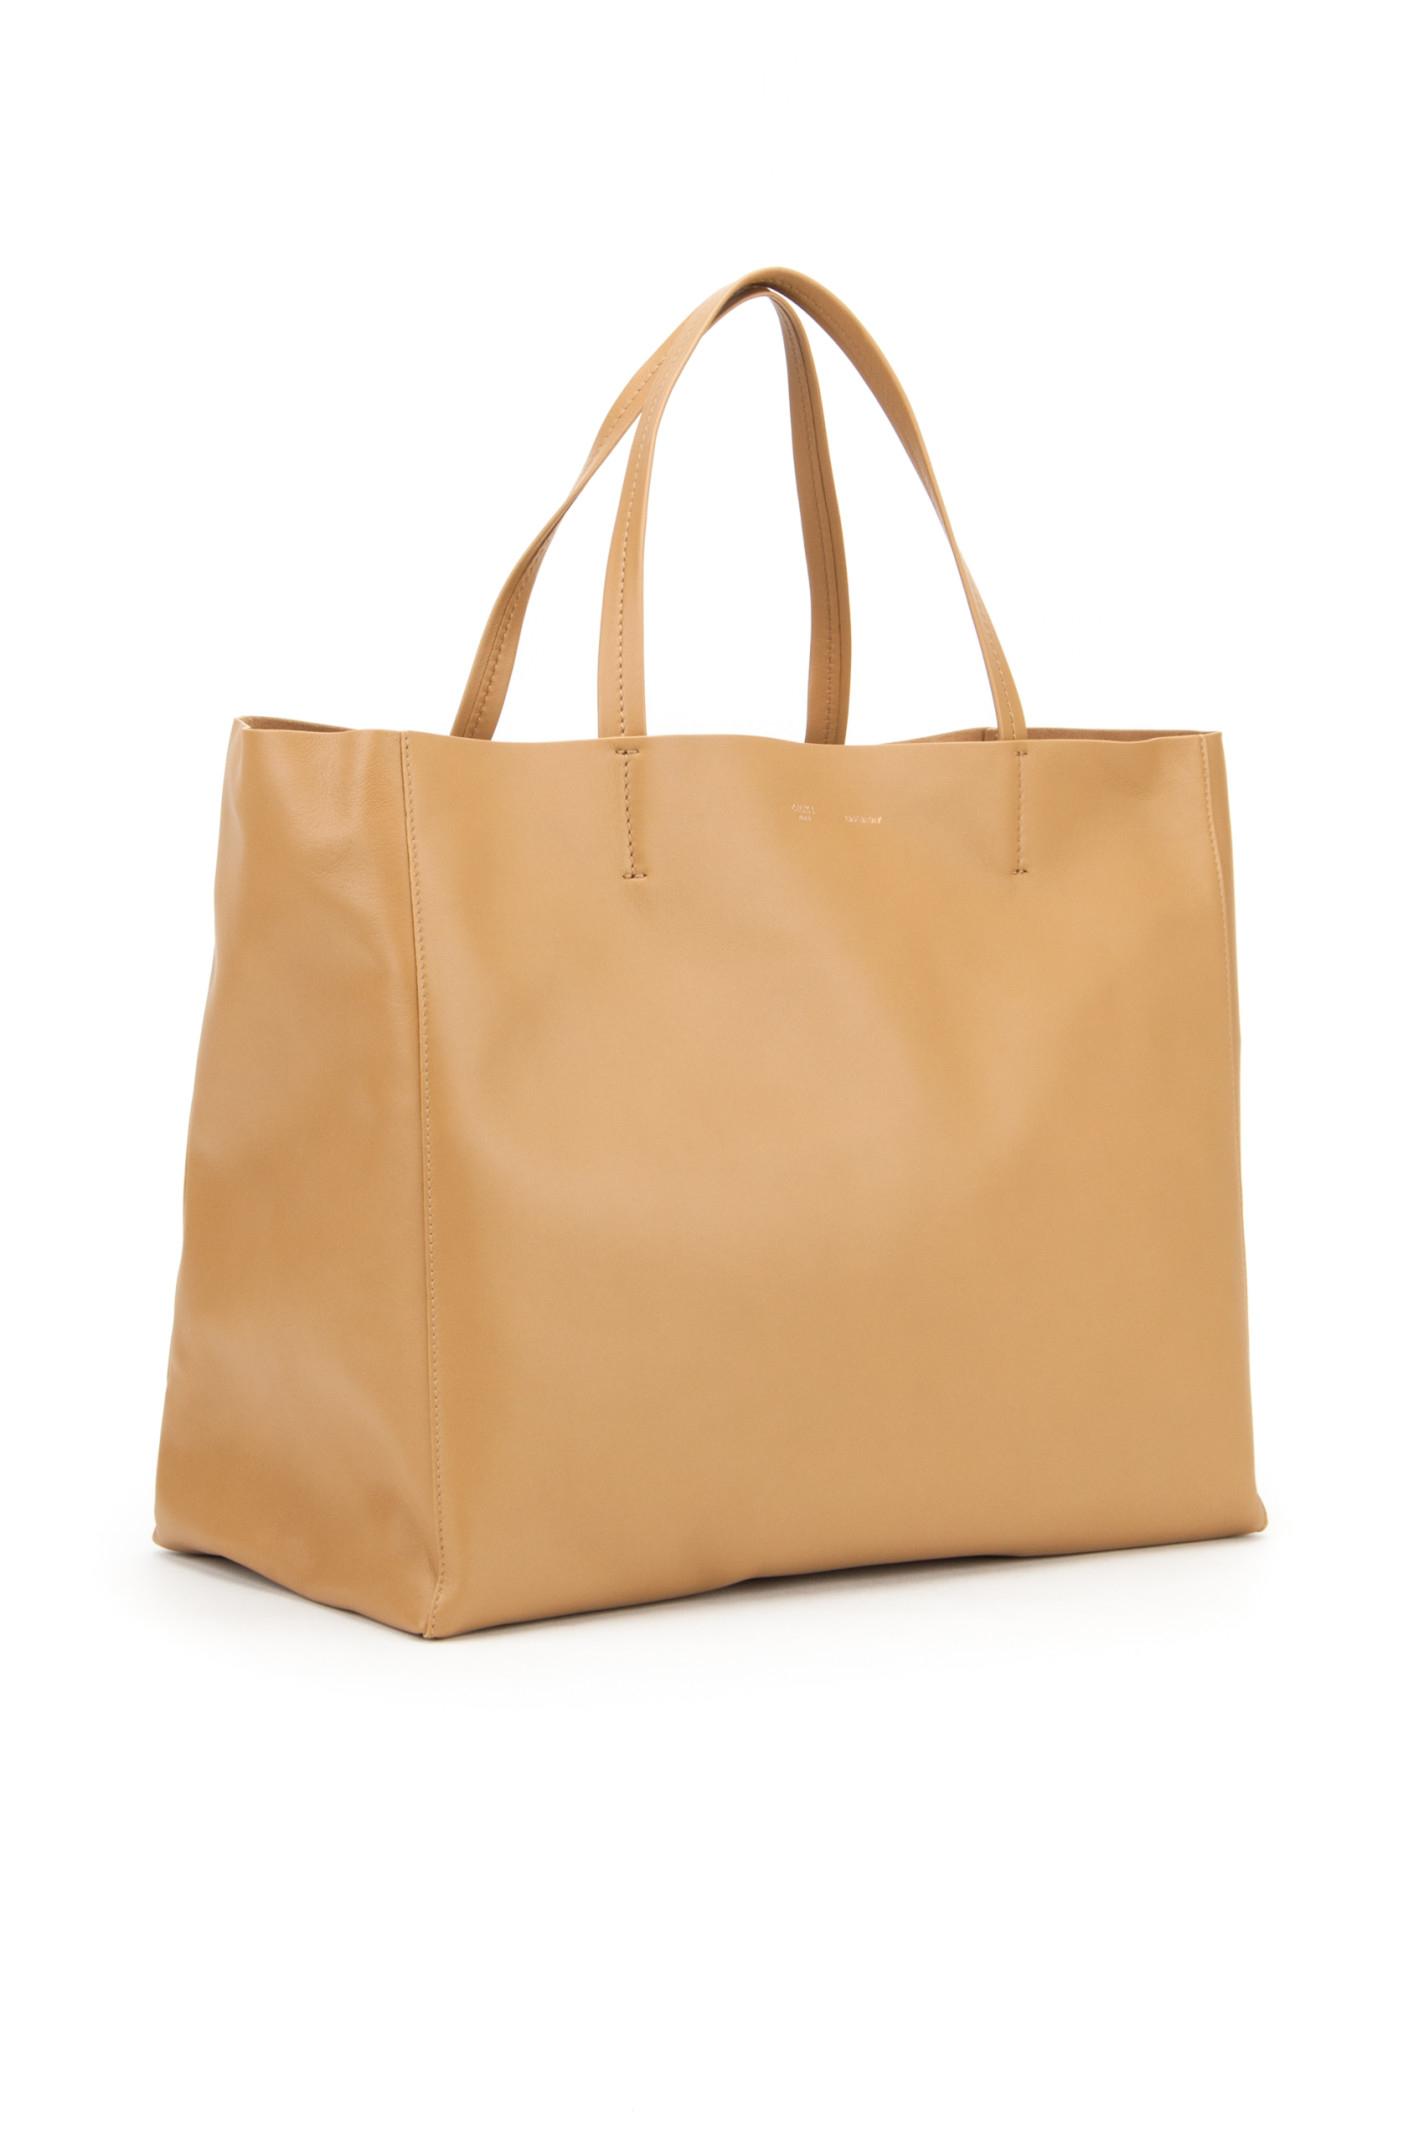 C¨¦line Horizontal Bag in Beige (CAMEL) | Lyst